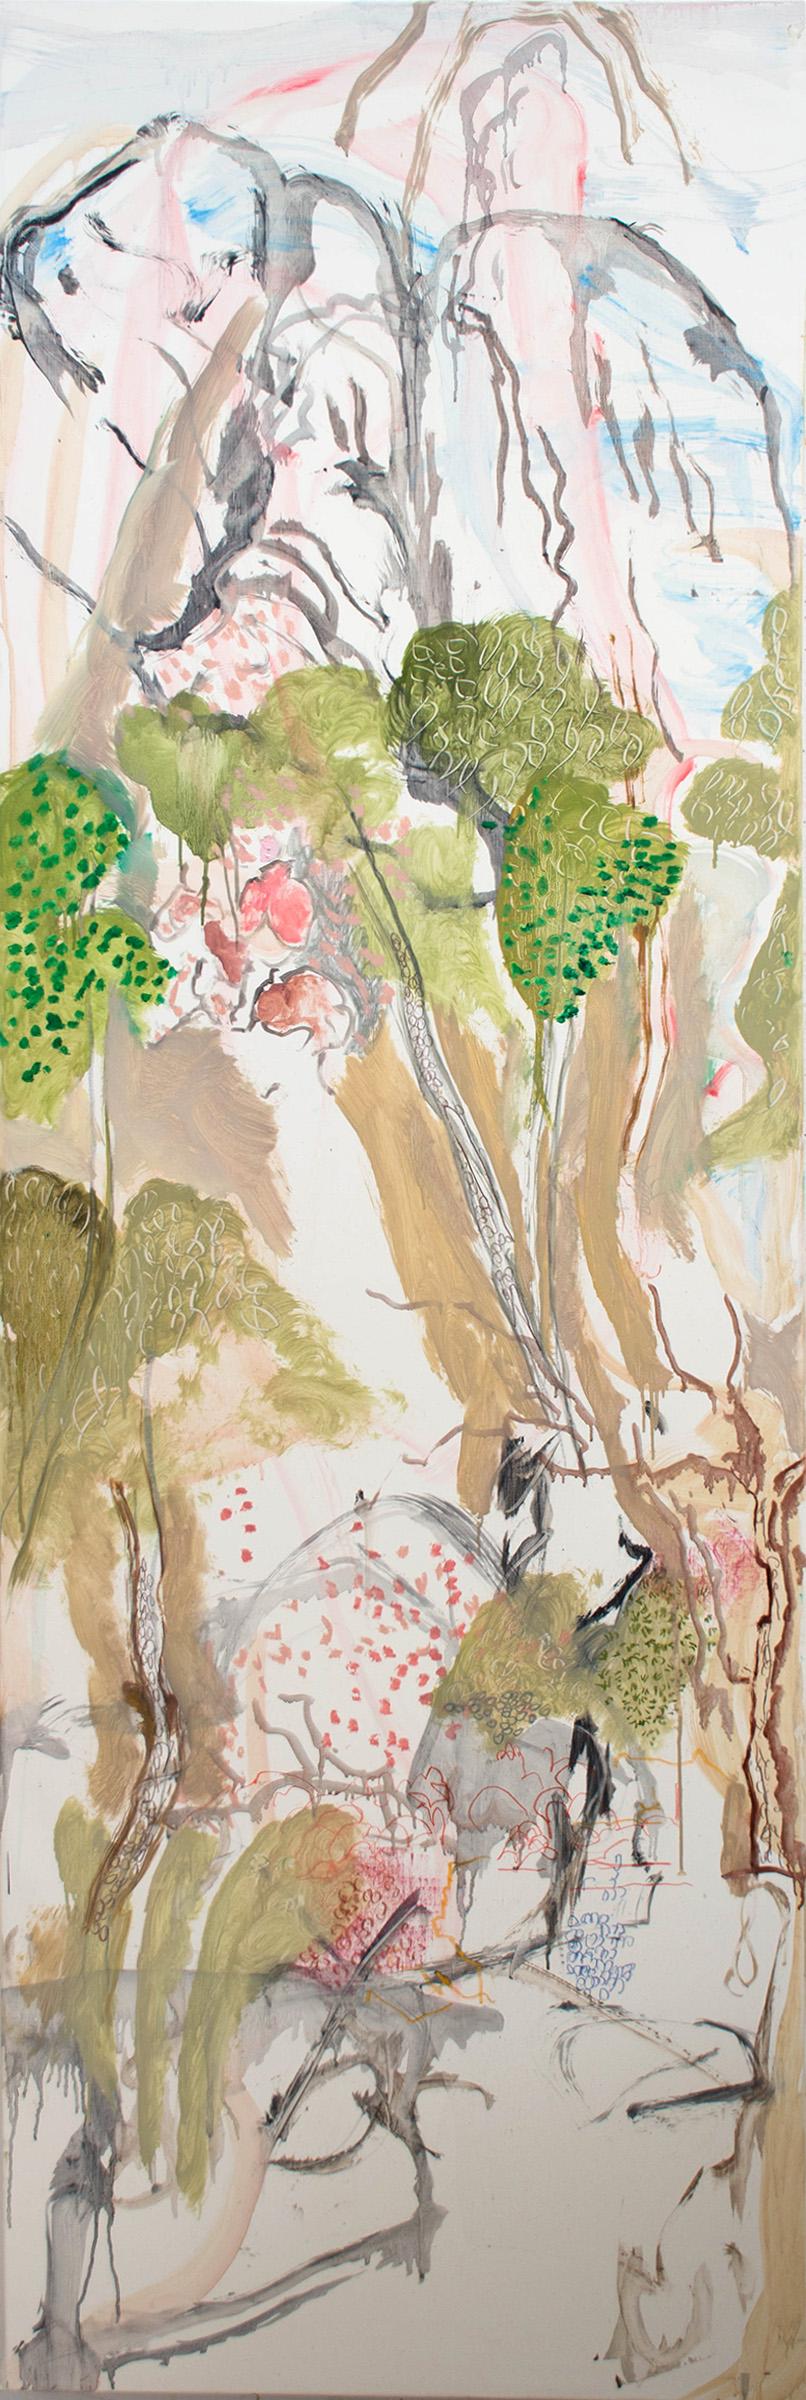 "gashu  78x26"" oil, oil stick, crayon & colored pencil on linen"